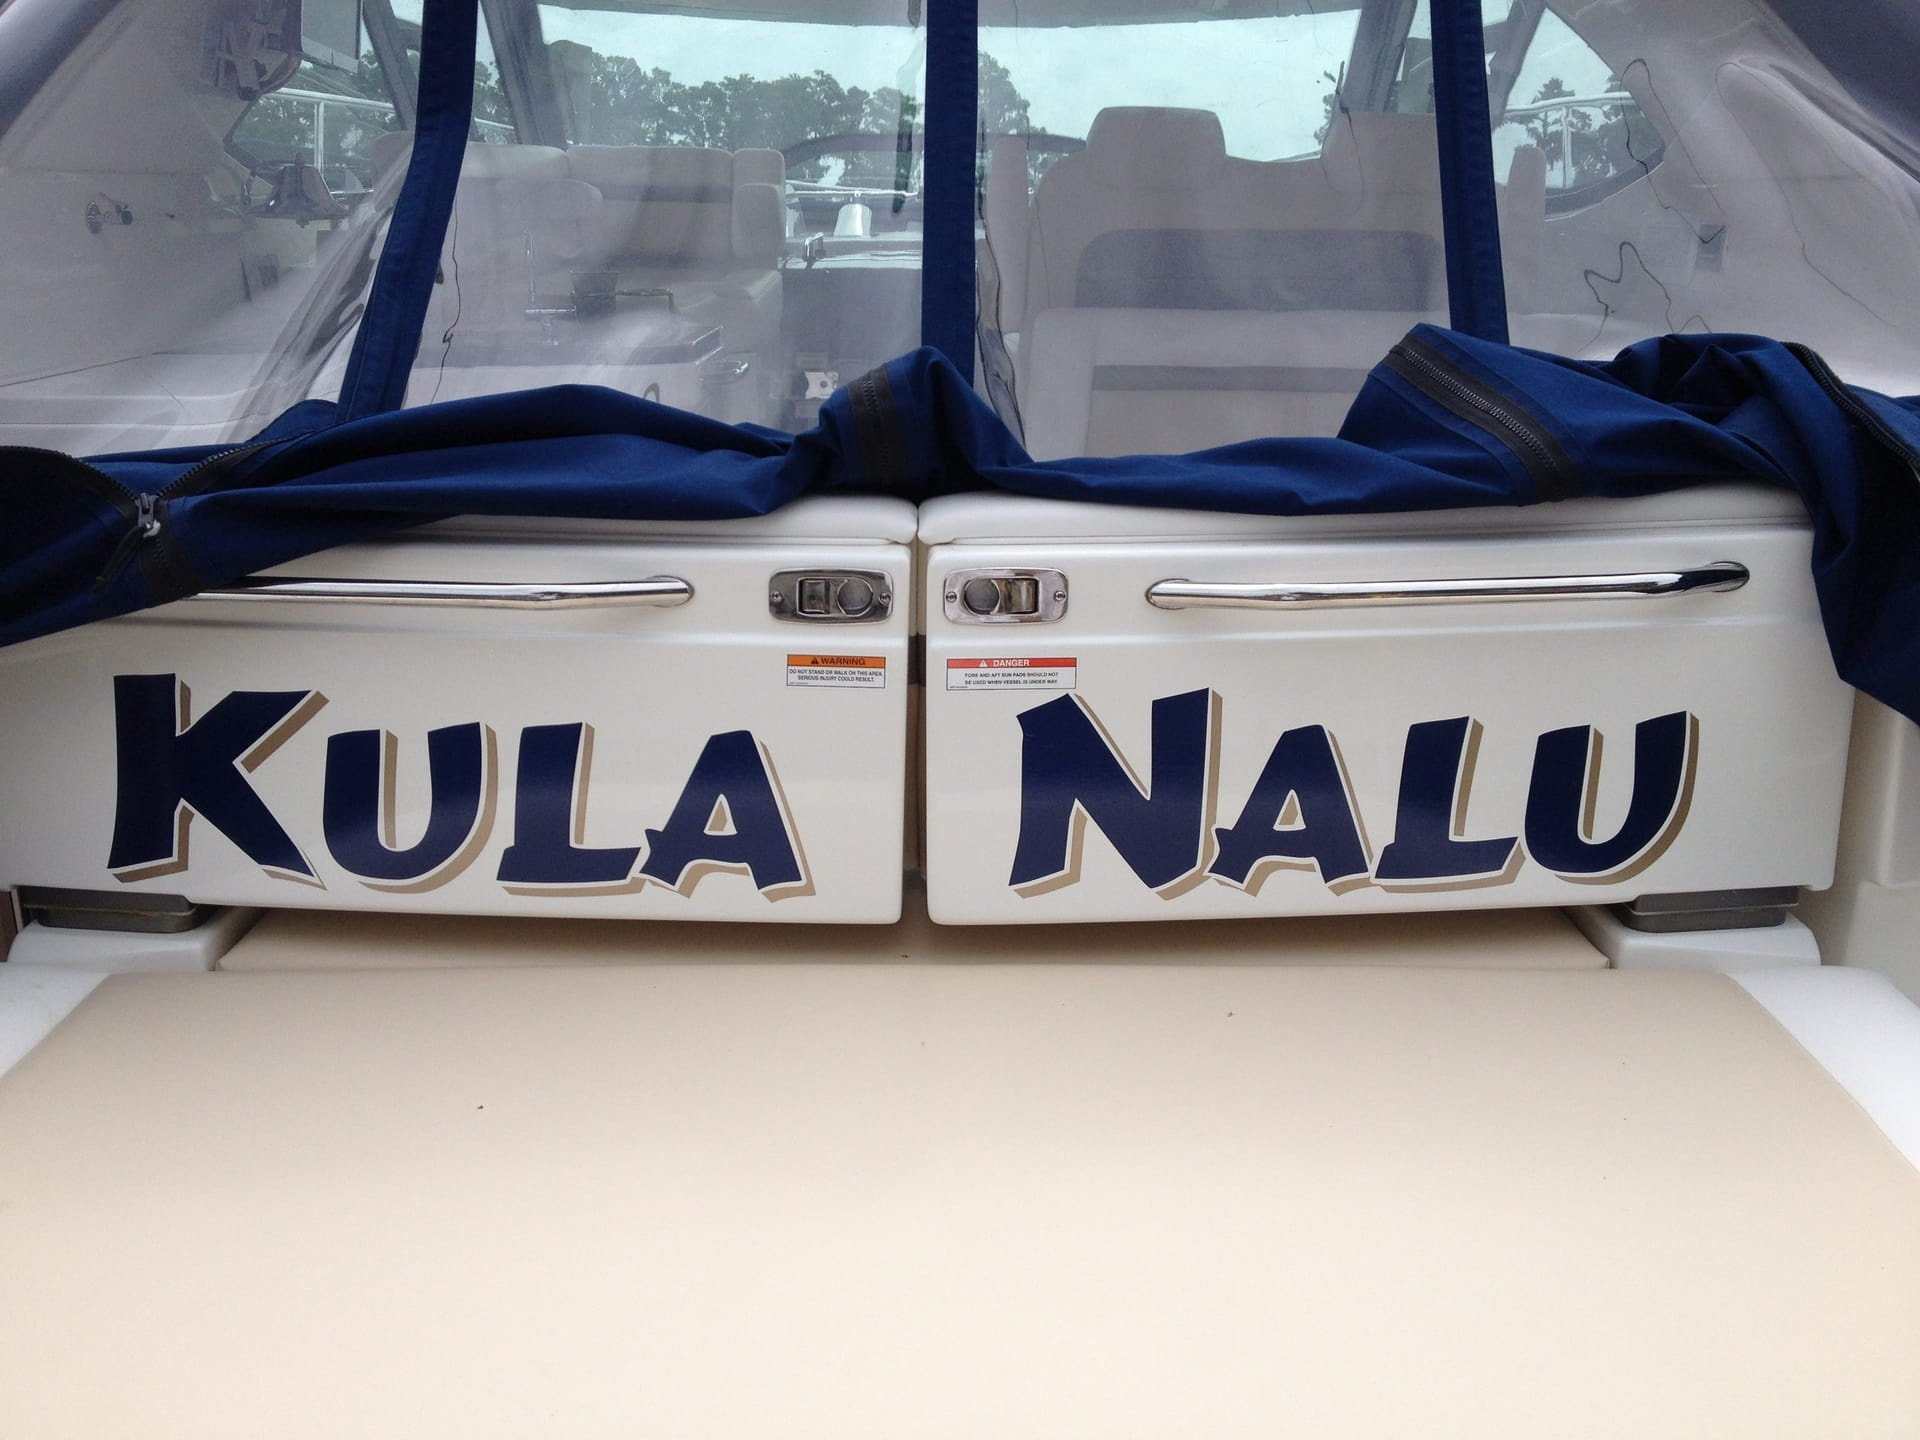 Kula Nalu Boat Lettering